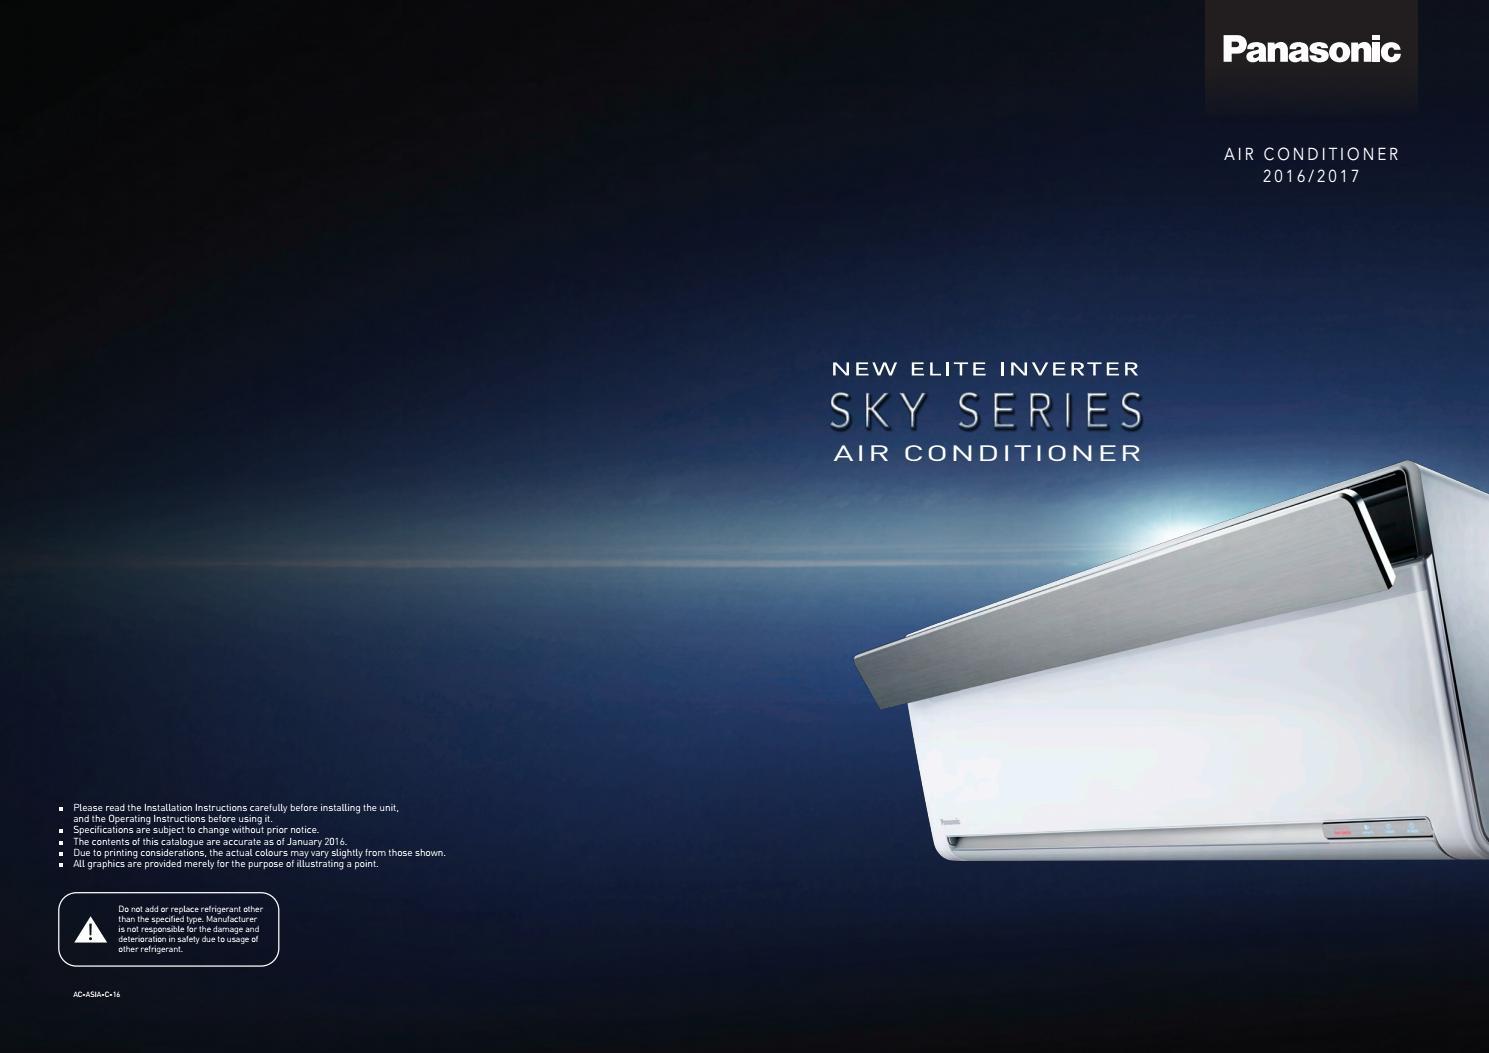 Panasonic Sky Series Air Conditioner 2016 By F W Shom Issuu